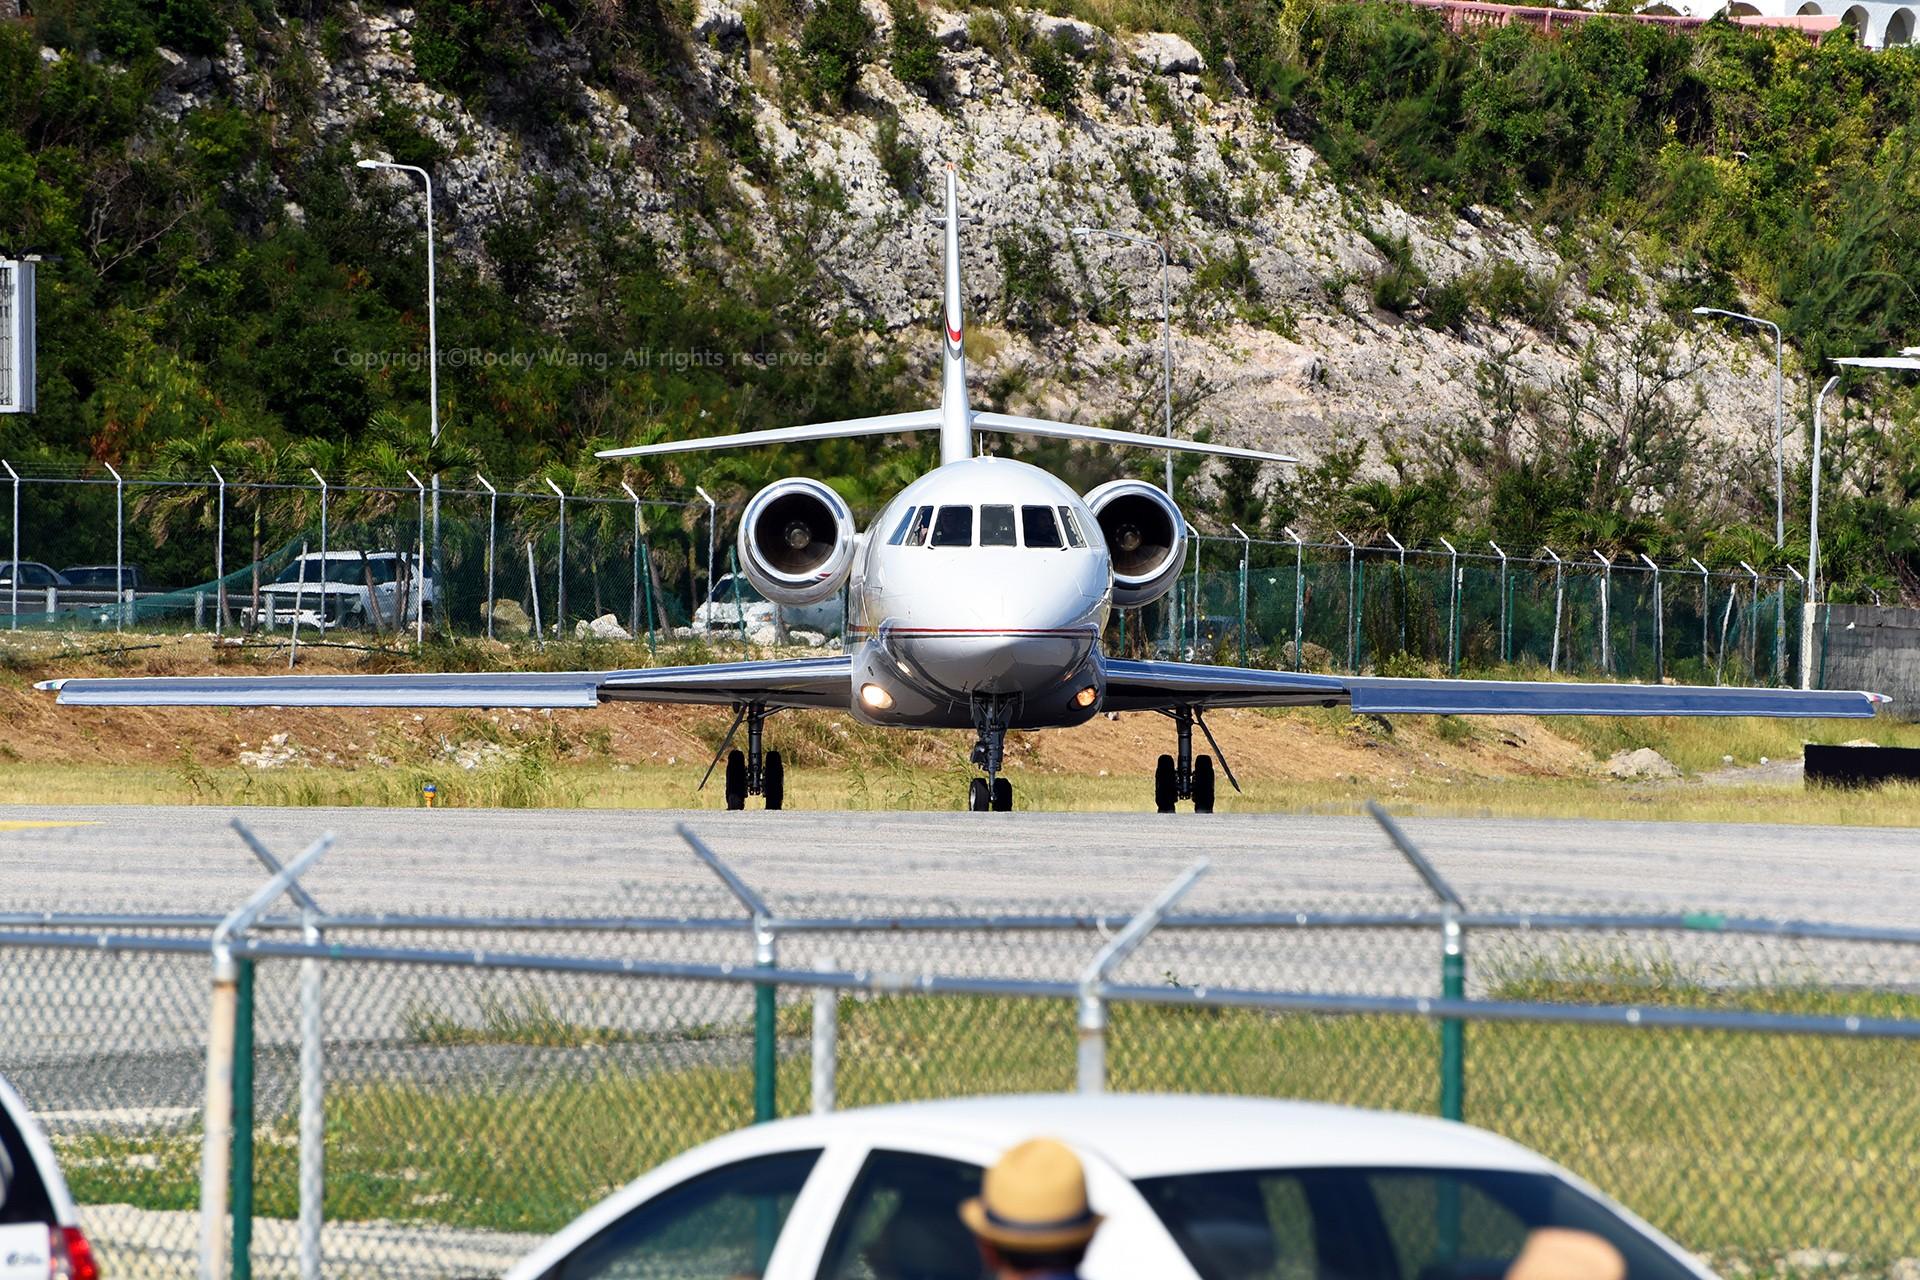 Re:[原创]My endless Caribbean dream——圣马丁朱莉安娜公主机场拍机记 DASSAULT FALCON 2000 N903GS 荷属安的列斯群岛朱利安娜公主机场